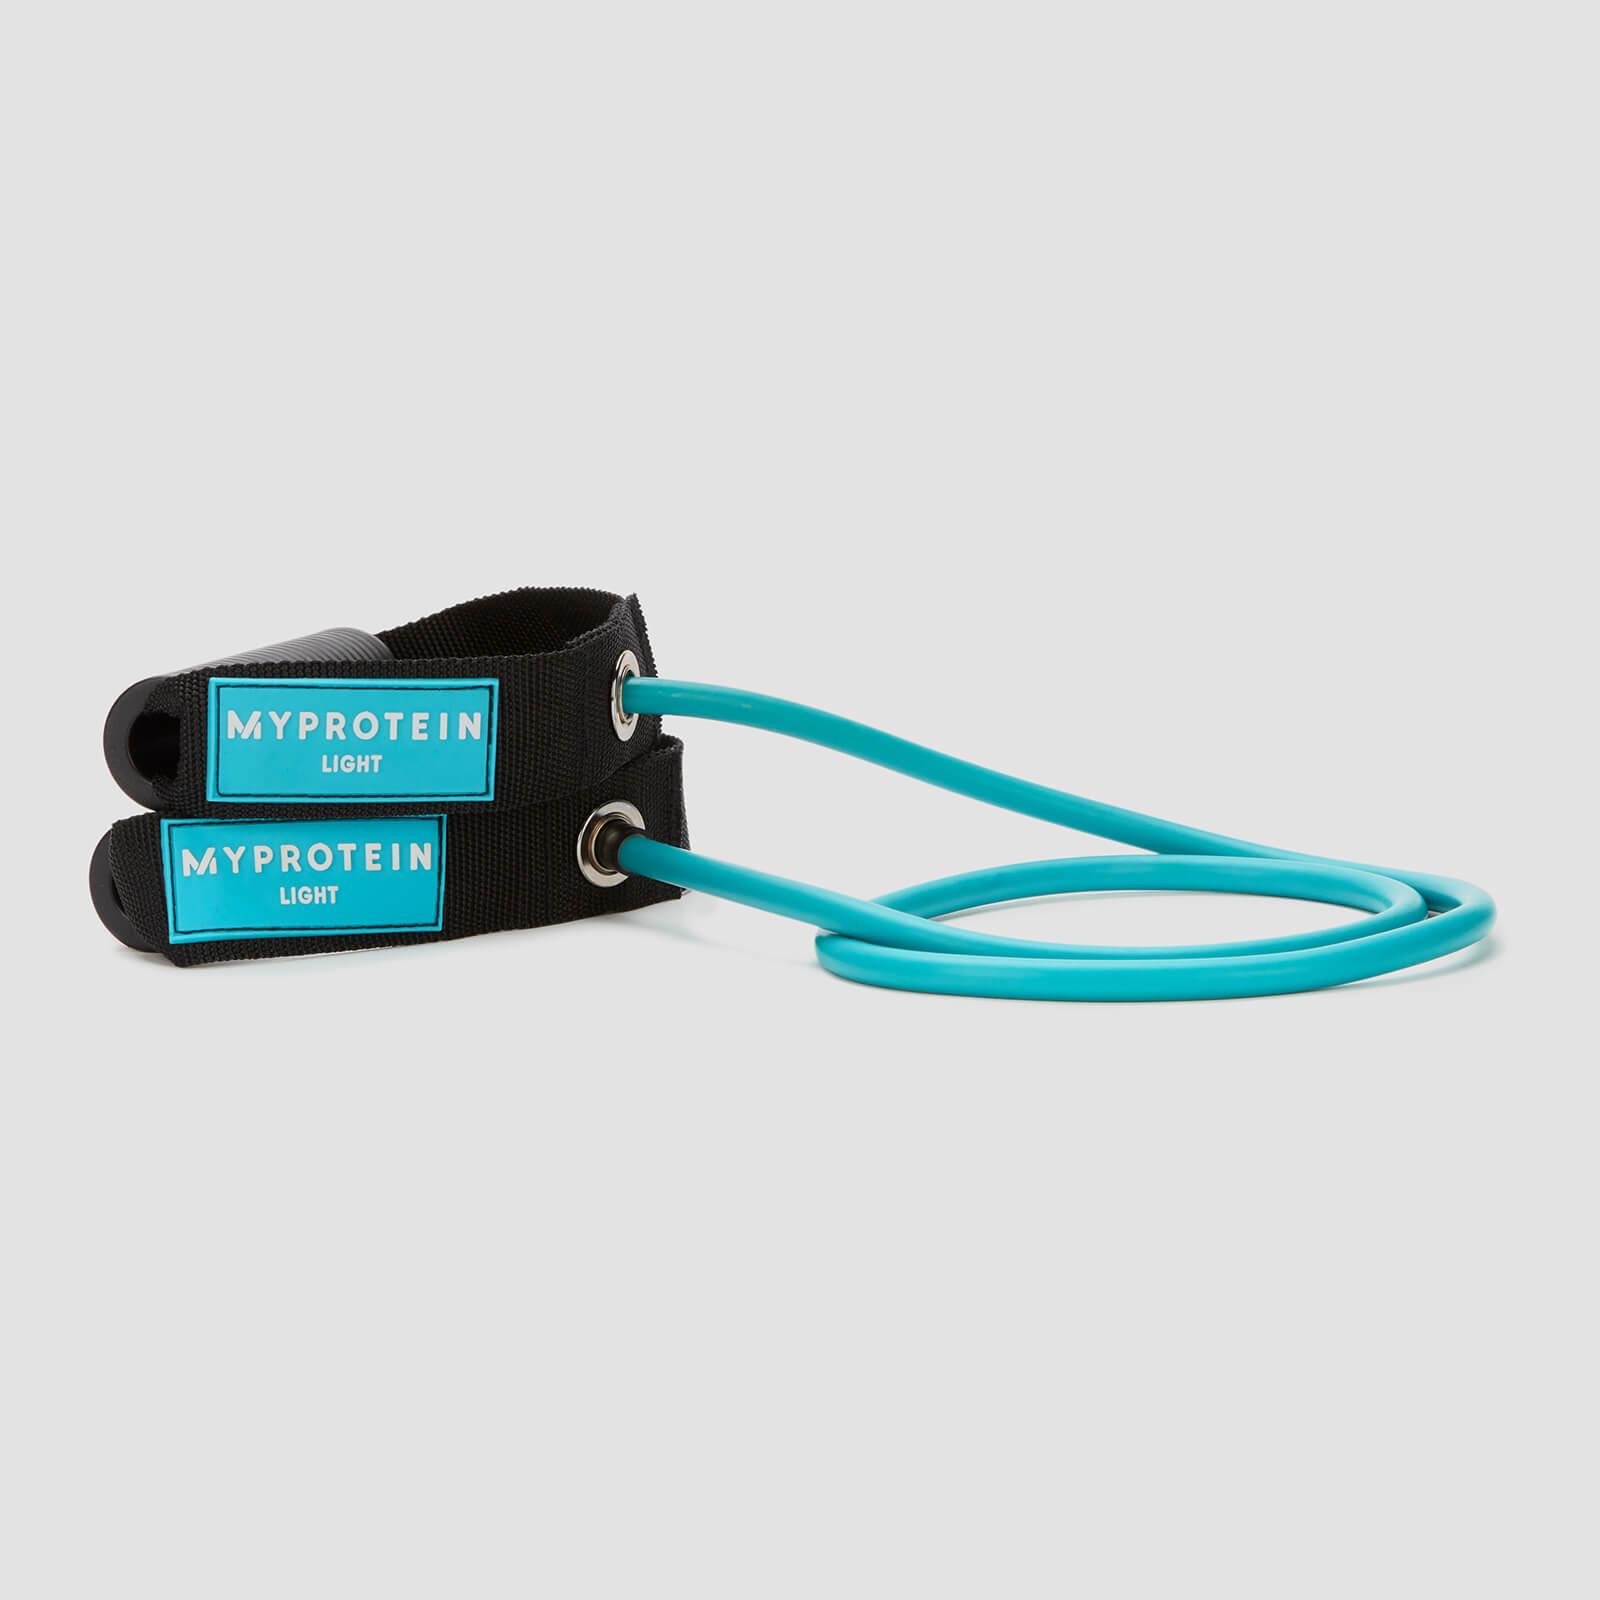 Myprotein Resistance Band - Light - Blue